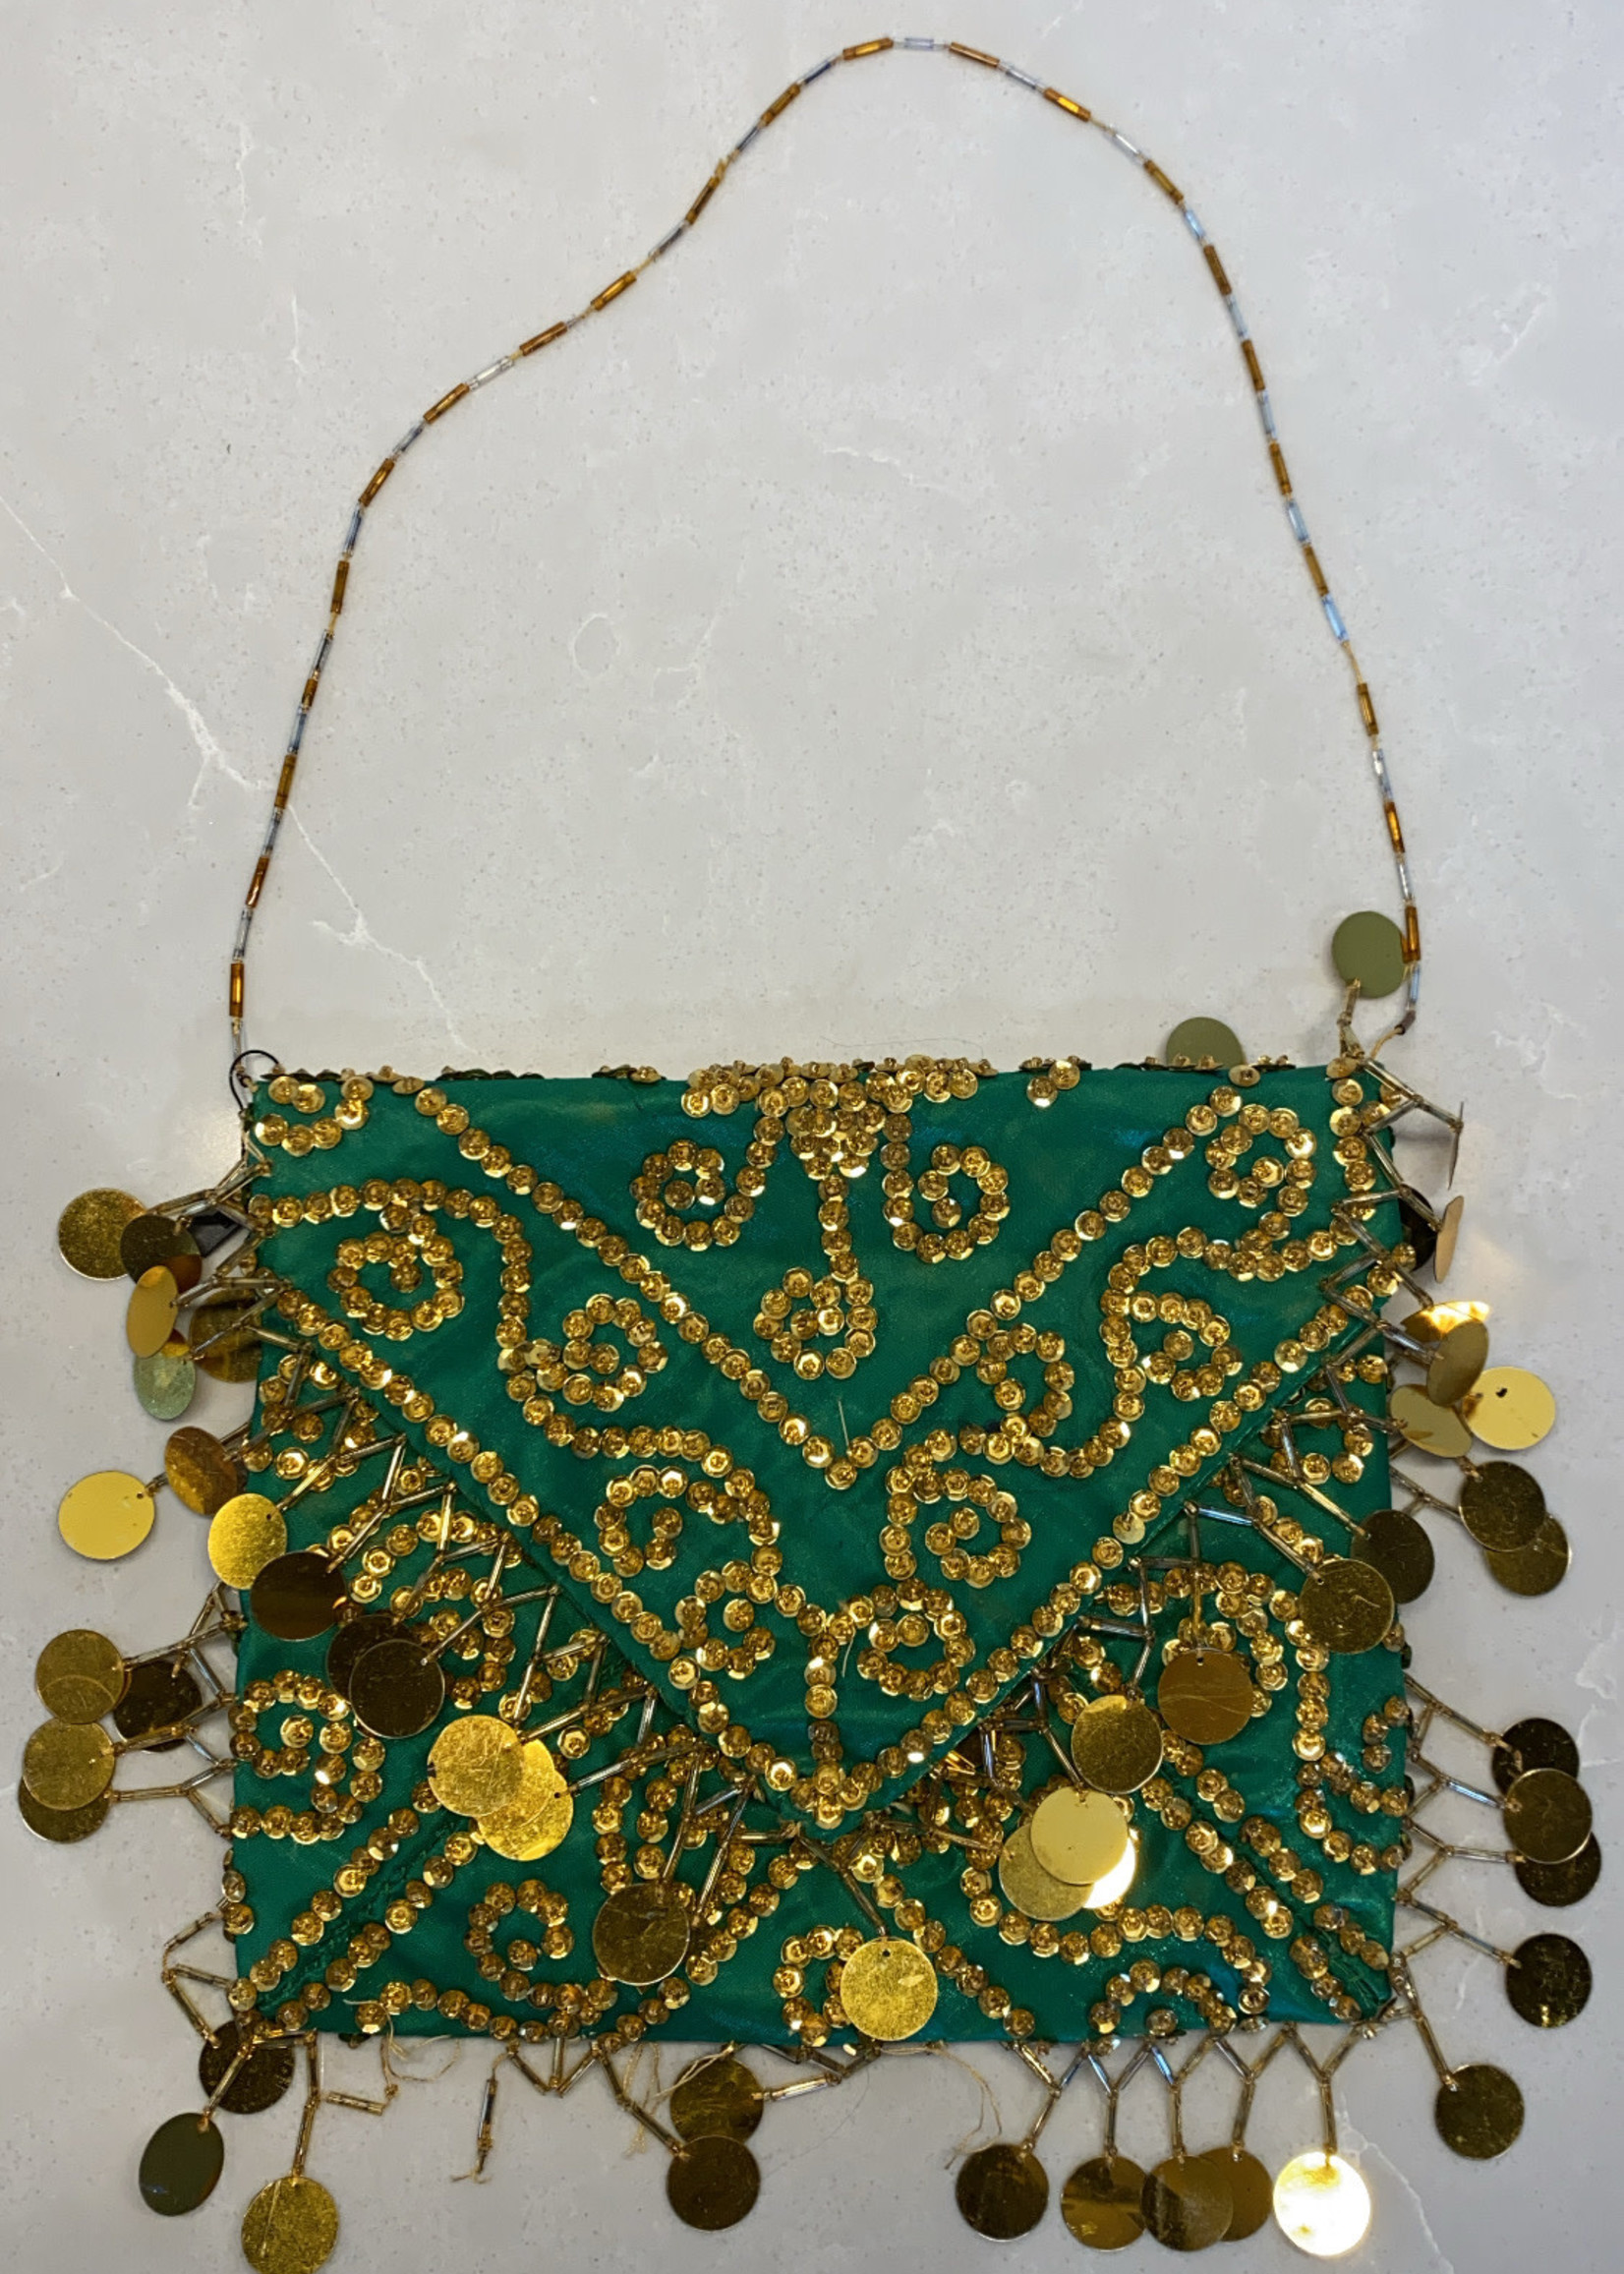 Green/Gold Sequin Purse